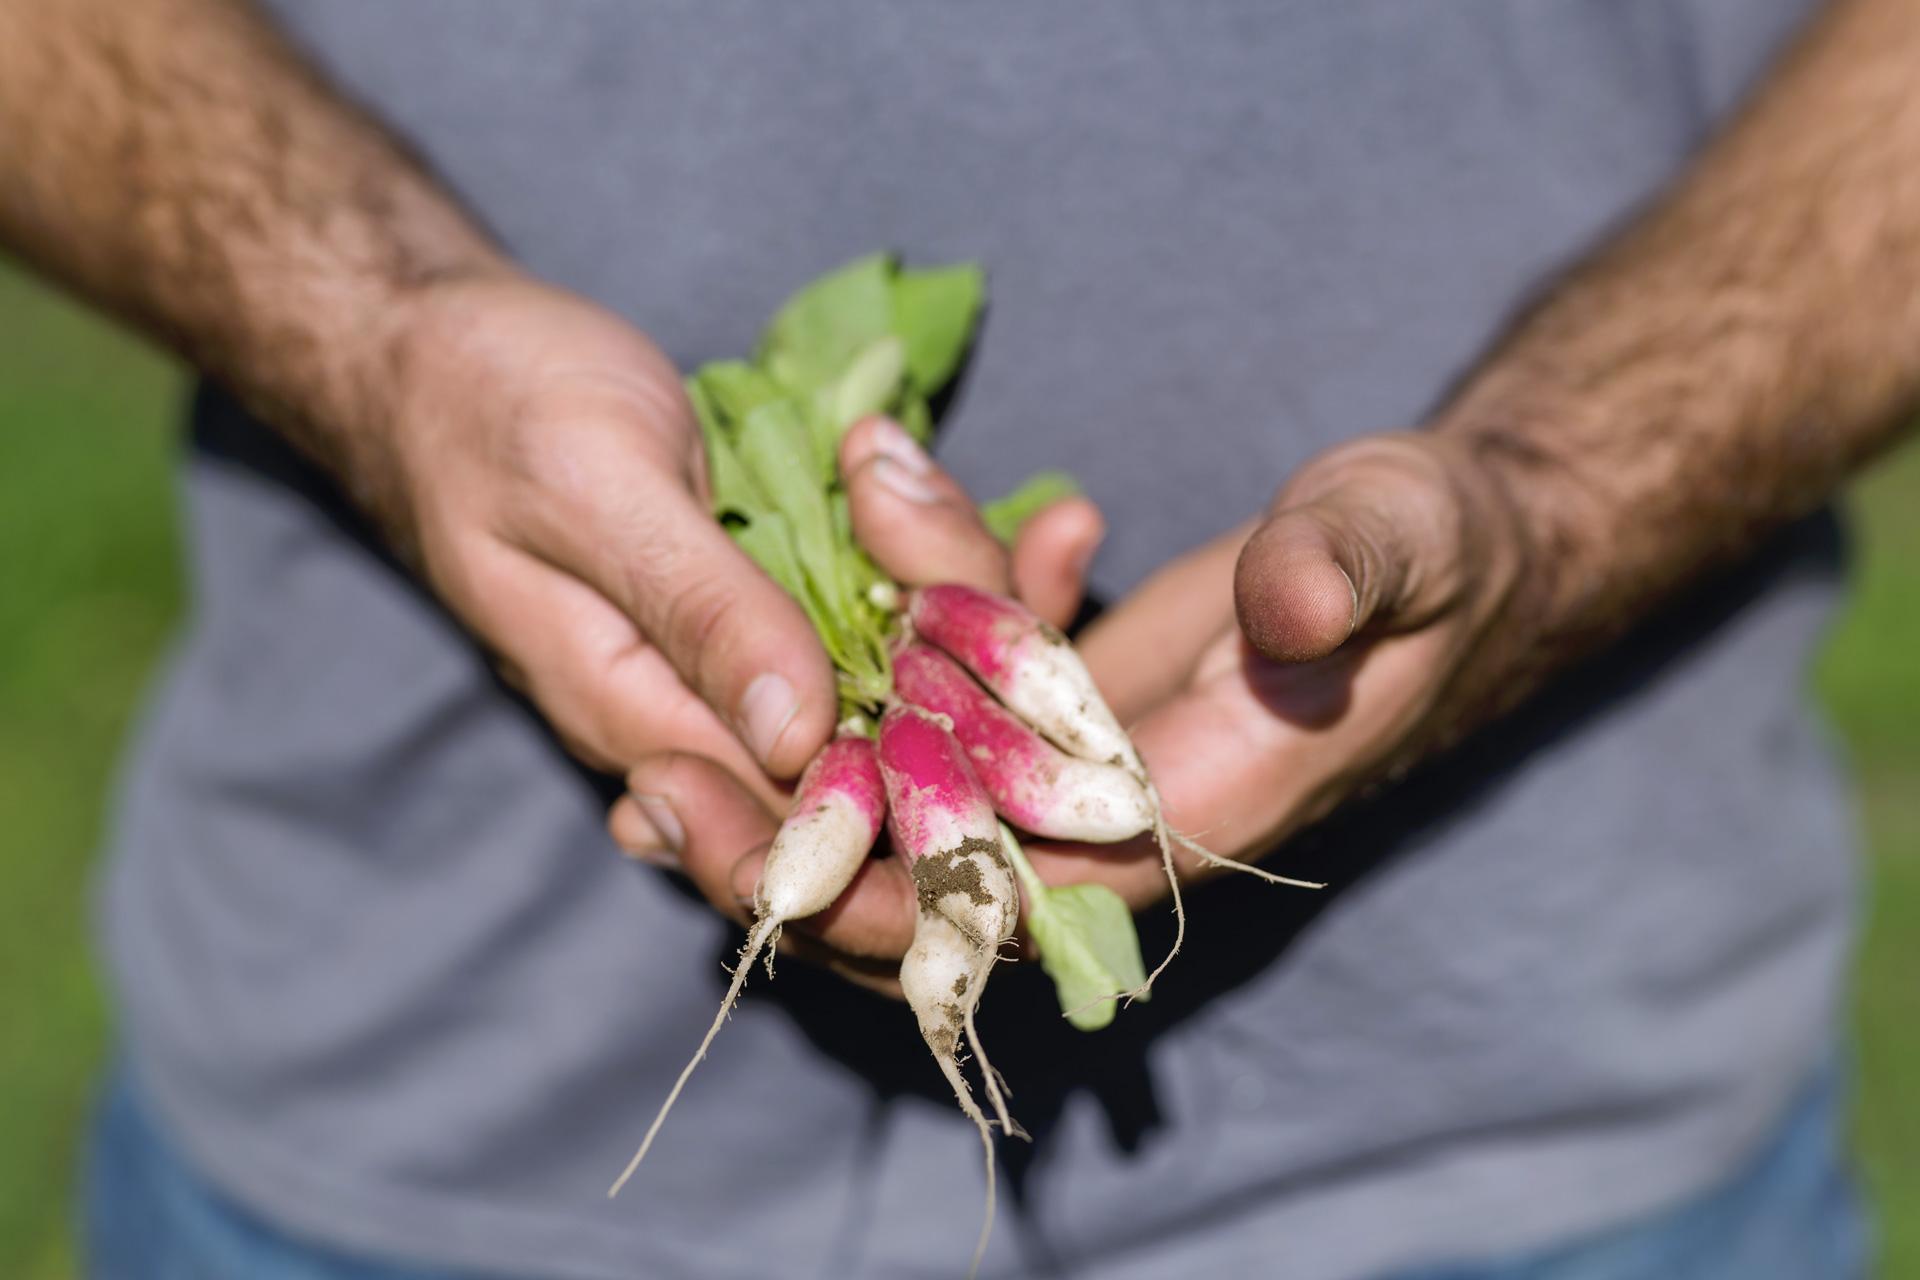 hands holding radishes